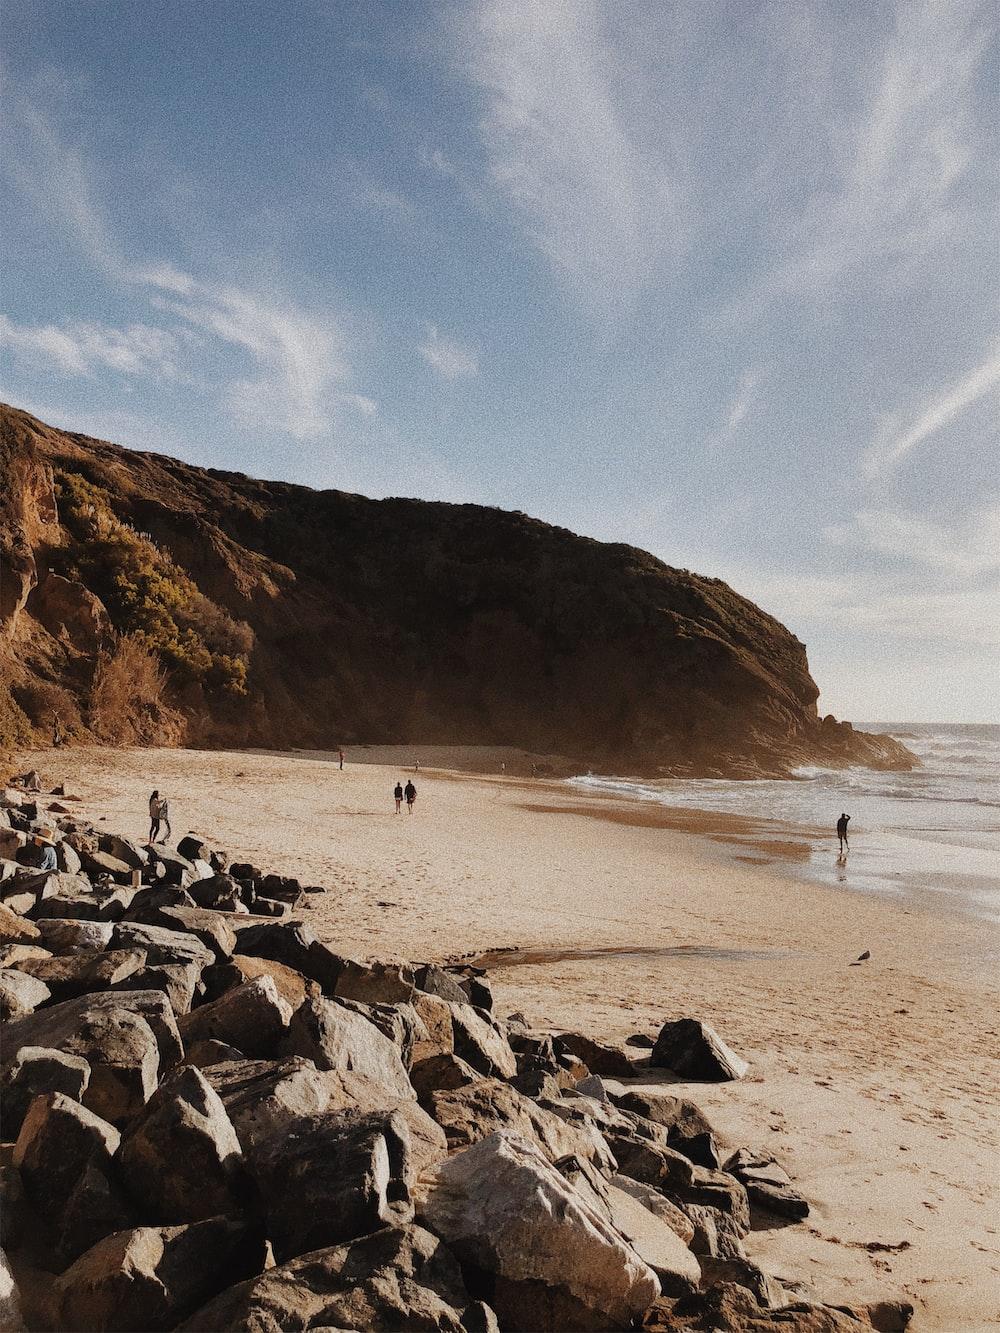 gray rocks beside seashores across mountain